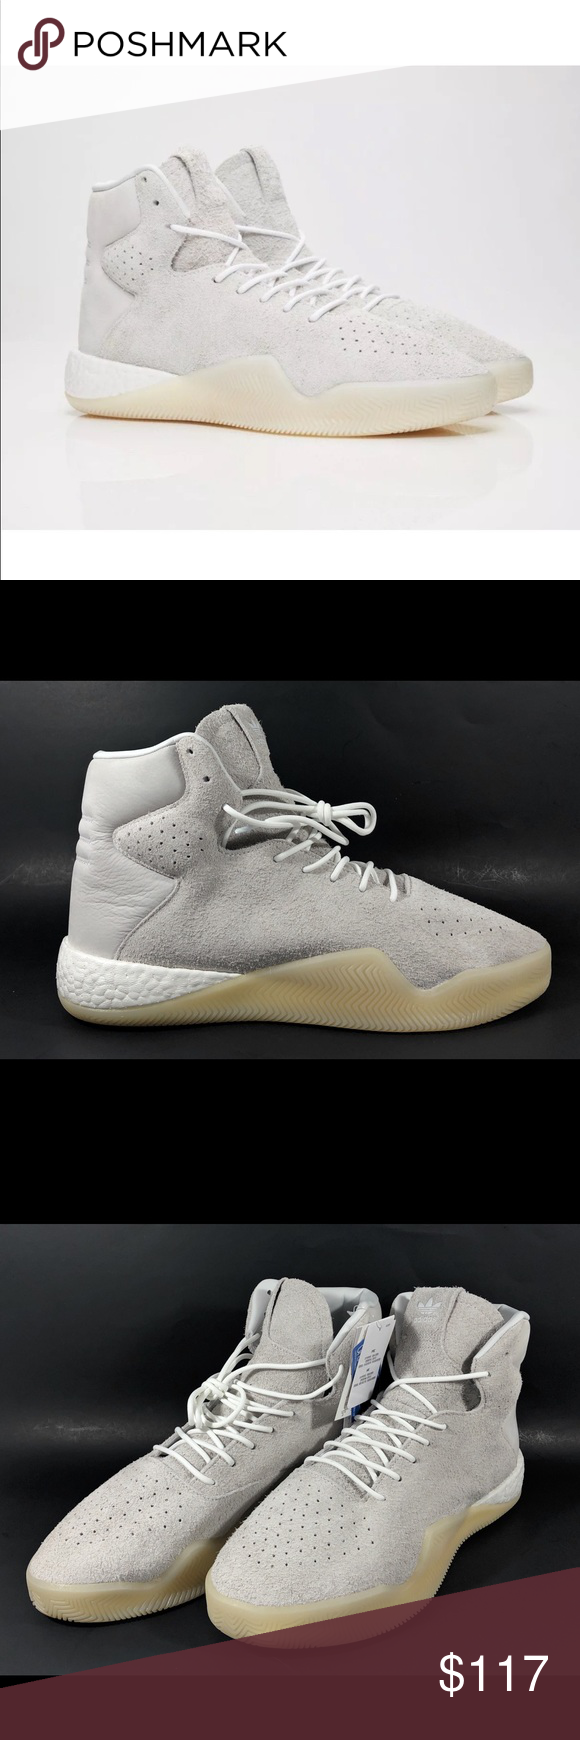 NEW Adidas Men's Tubular Sneakers Adidas Originals BB8947